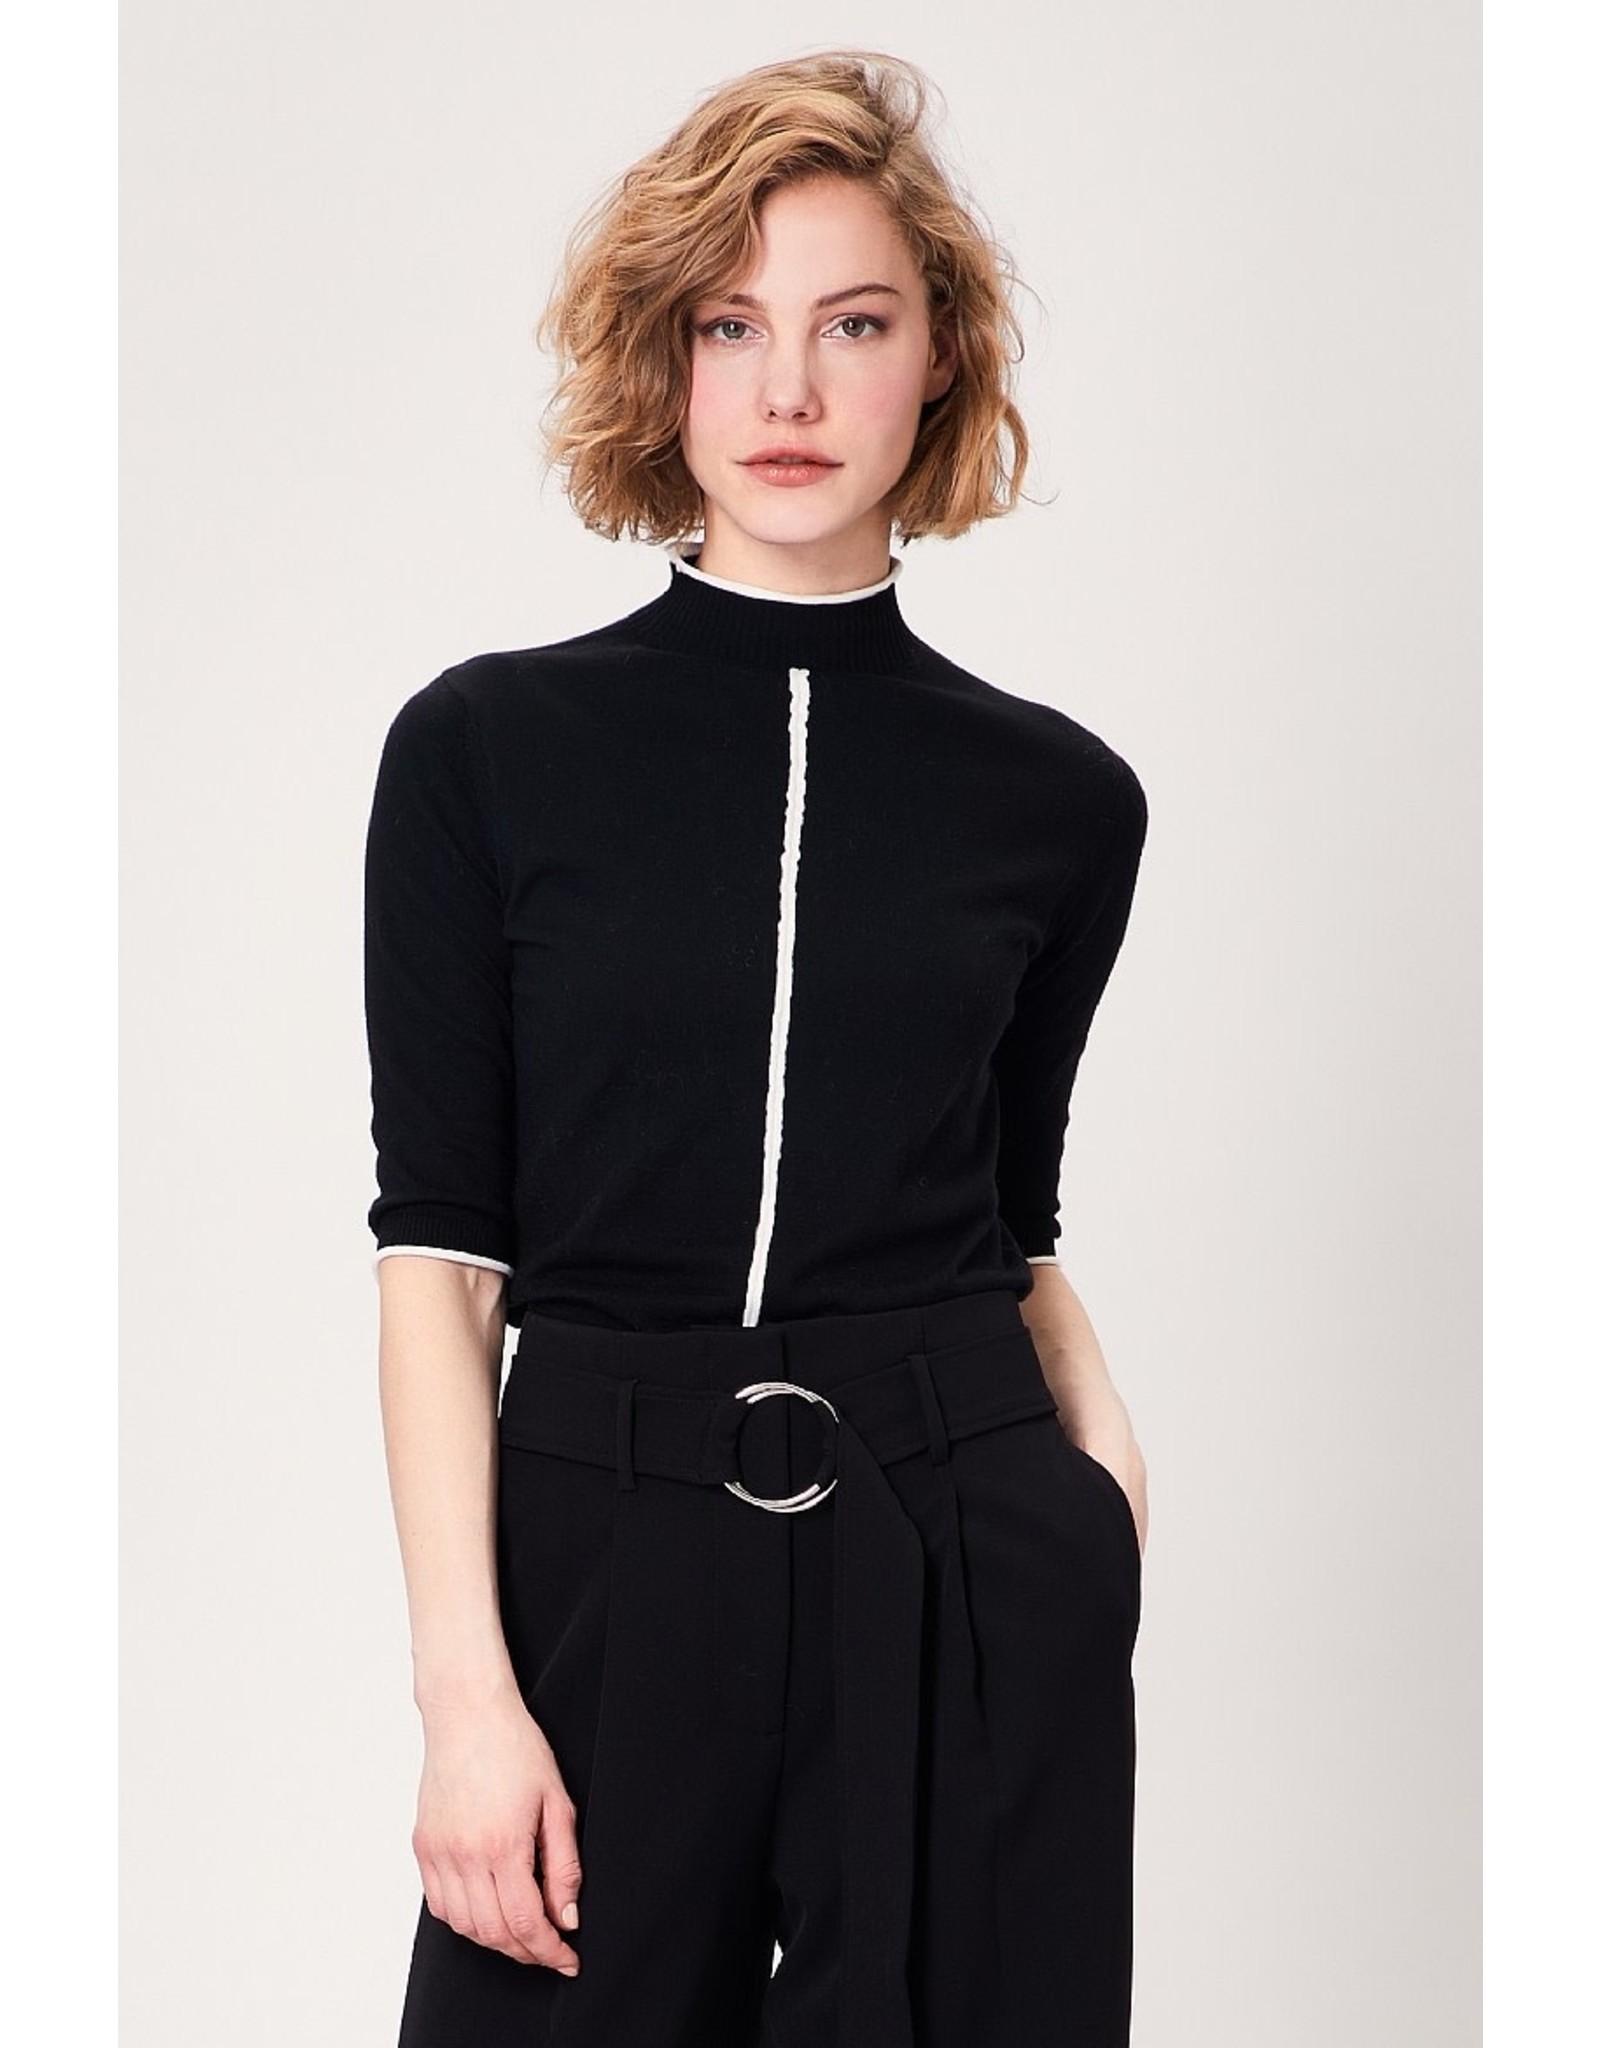 AngelEye Arya top (black)